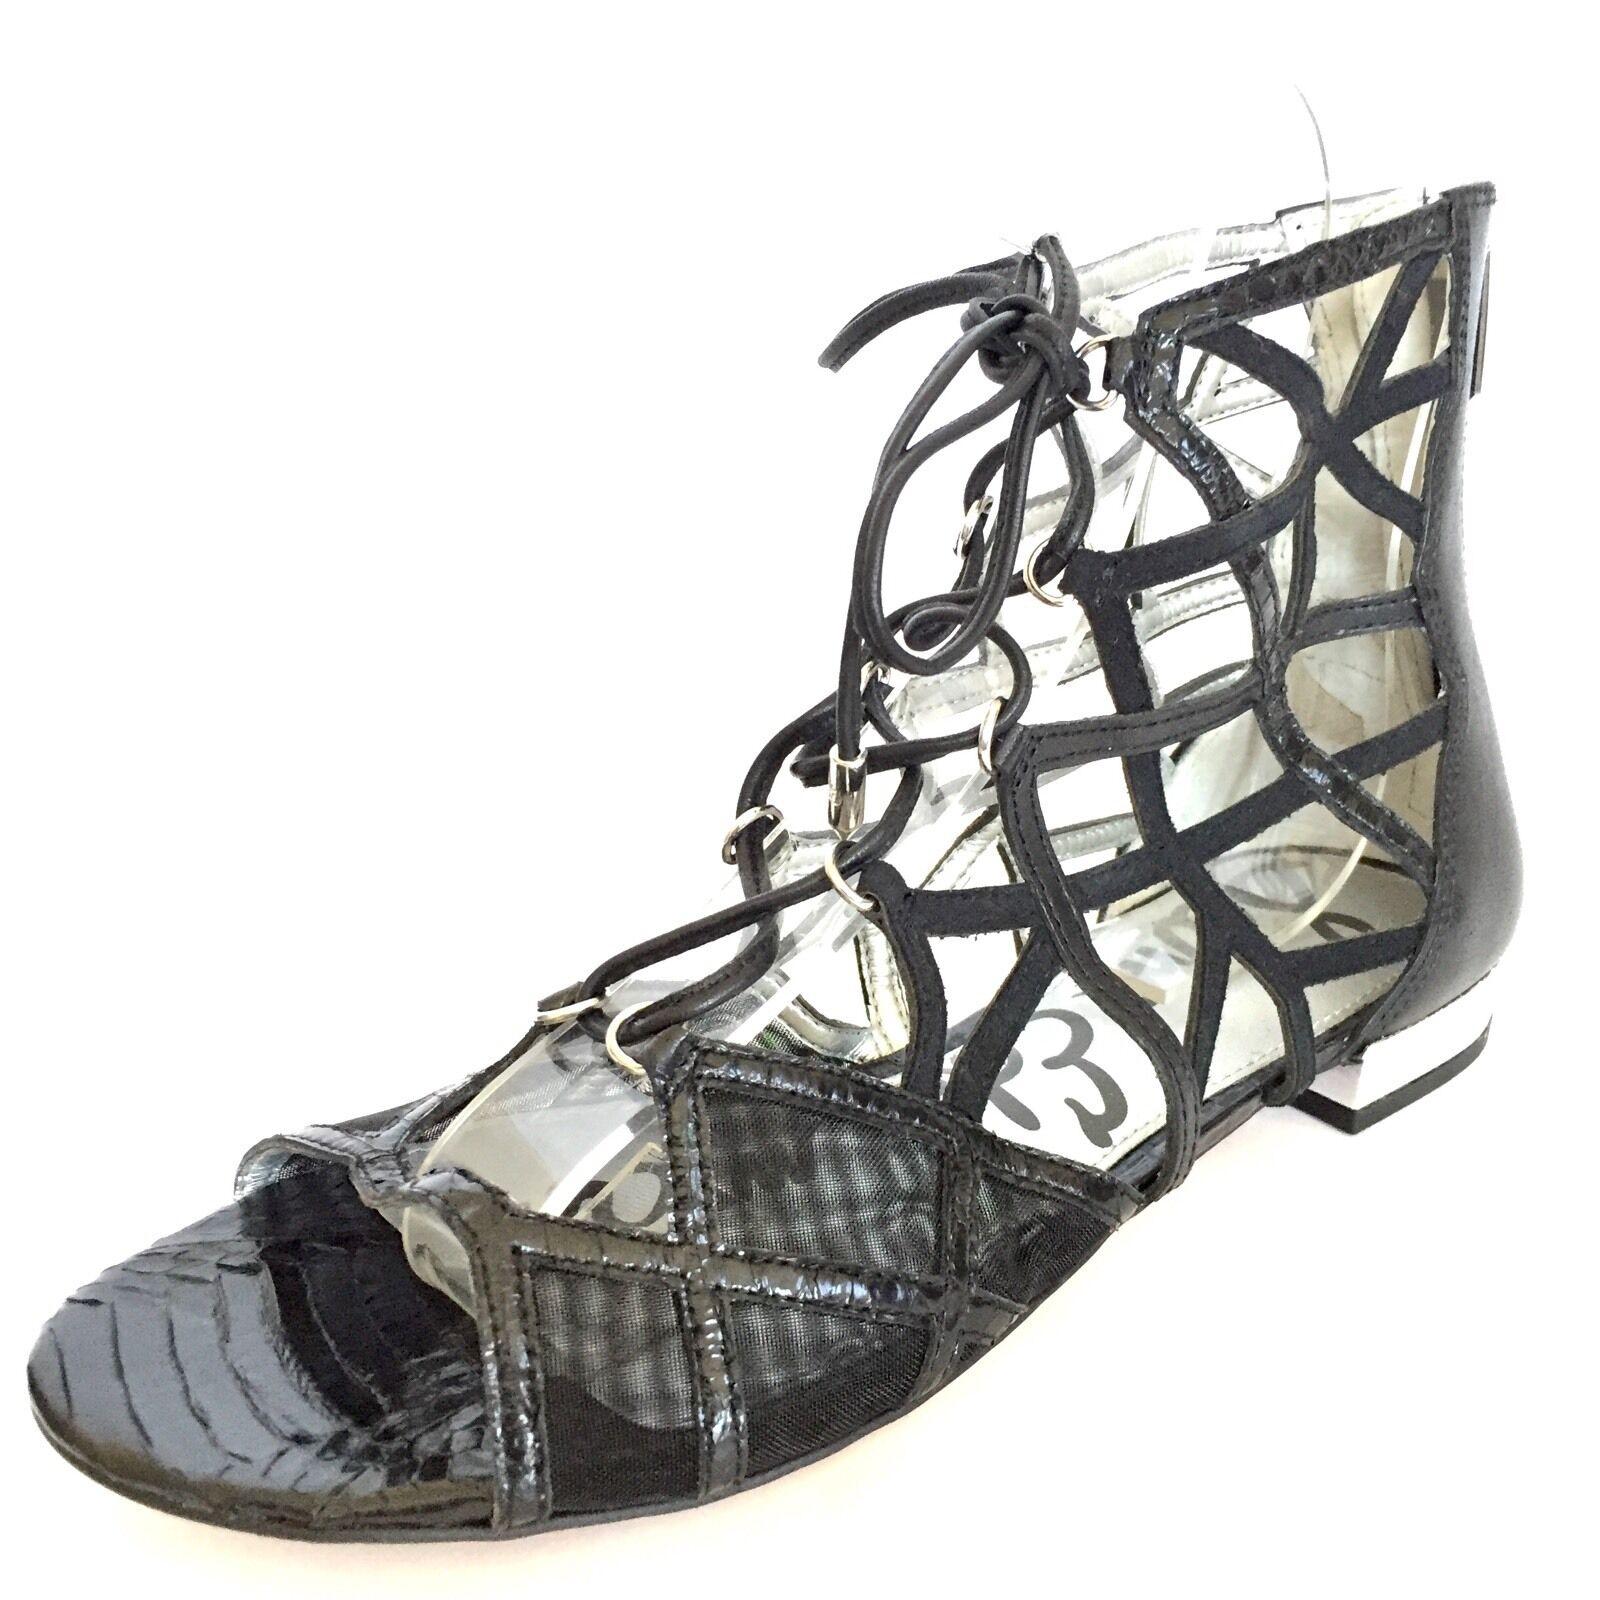 Sam Edelman Women's Denver Sandals Gladiator Leather Black Size 7 M RP  130